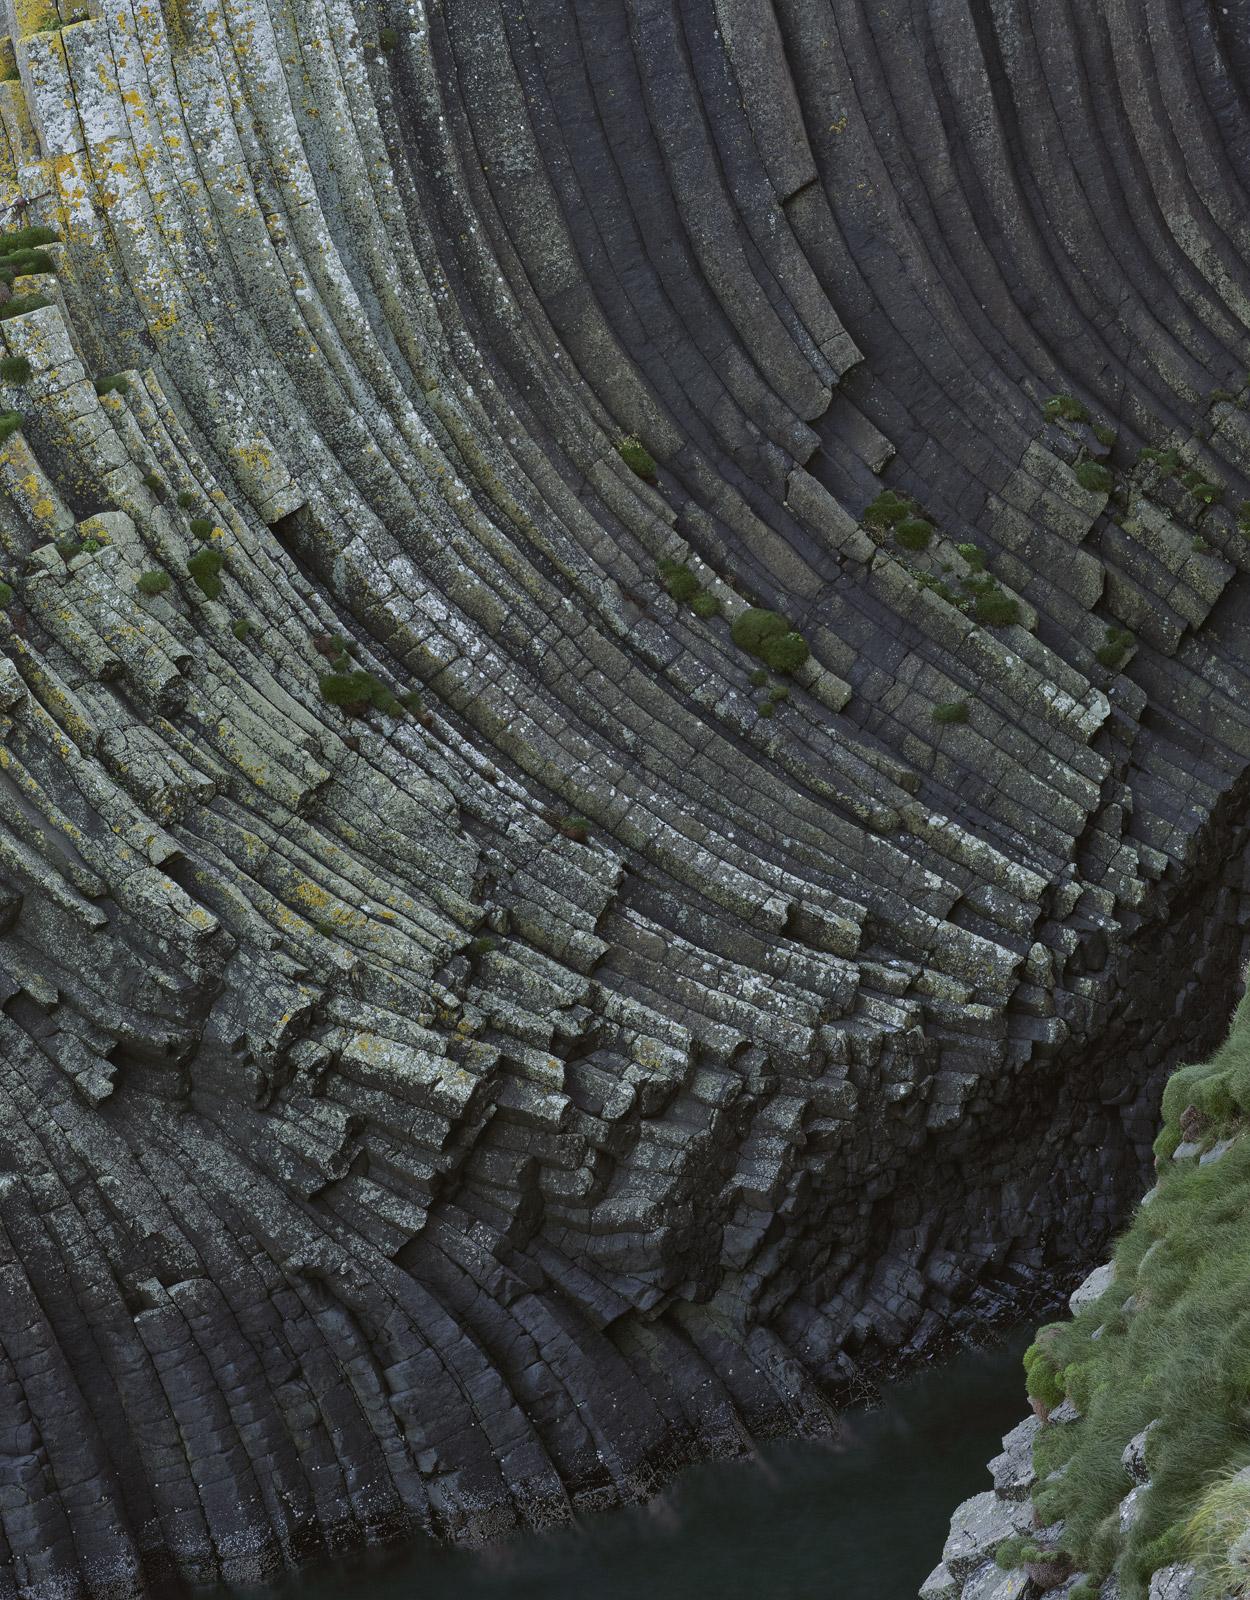 Clamshell Basalt, Staffa, Inner Hebrides, Scotland, cliff, remarkable, basalt, columns, island, curved, parallel, boat, photo